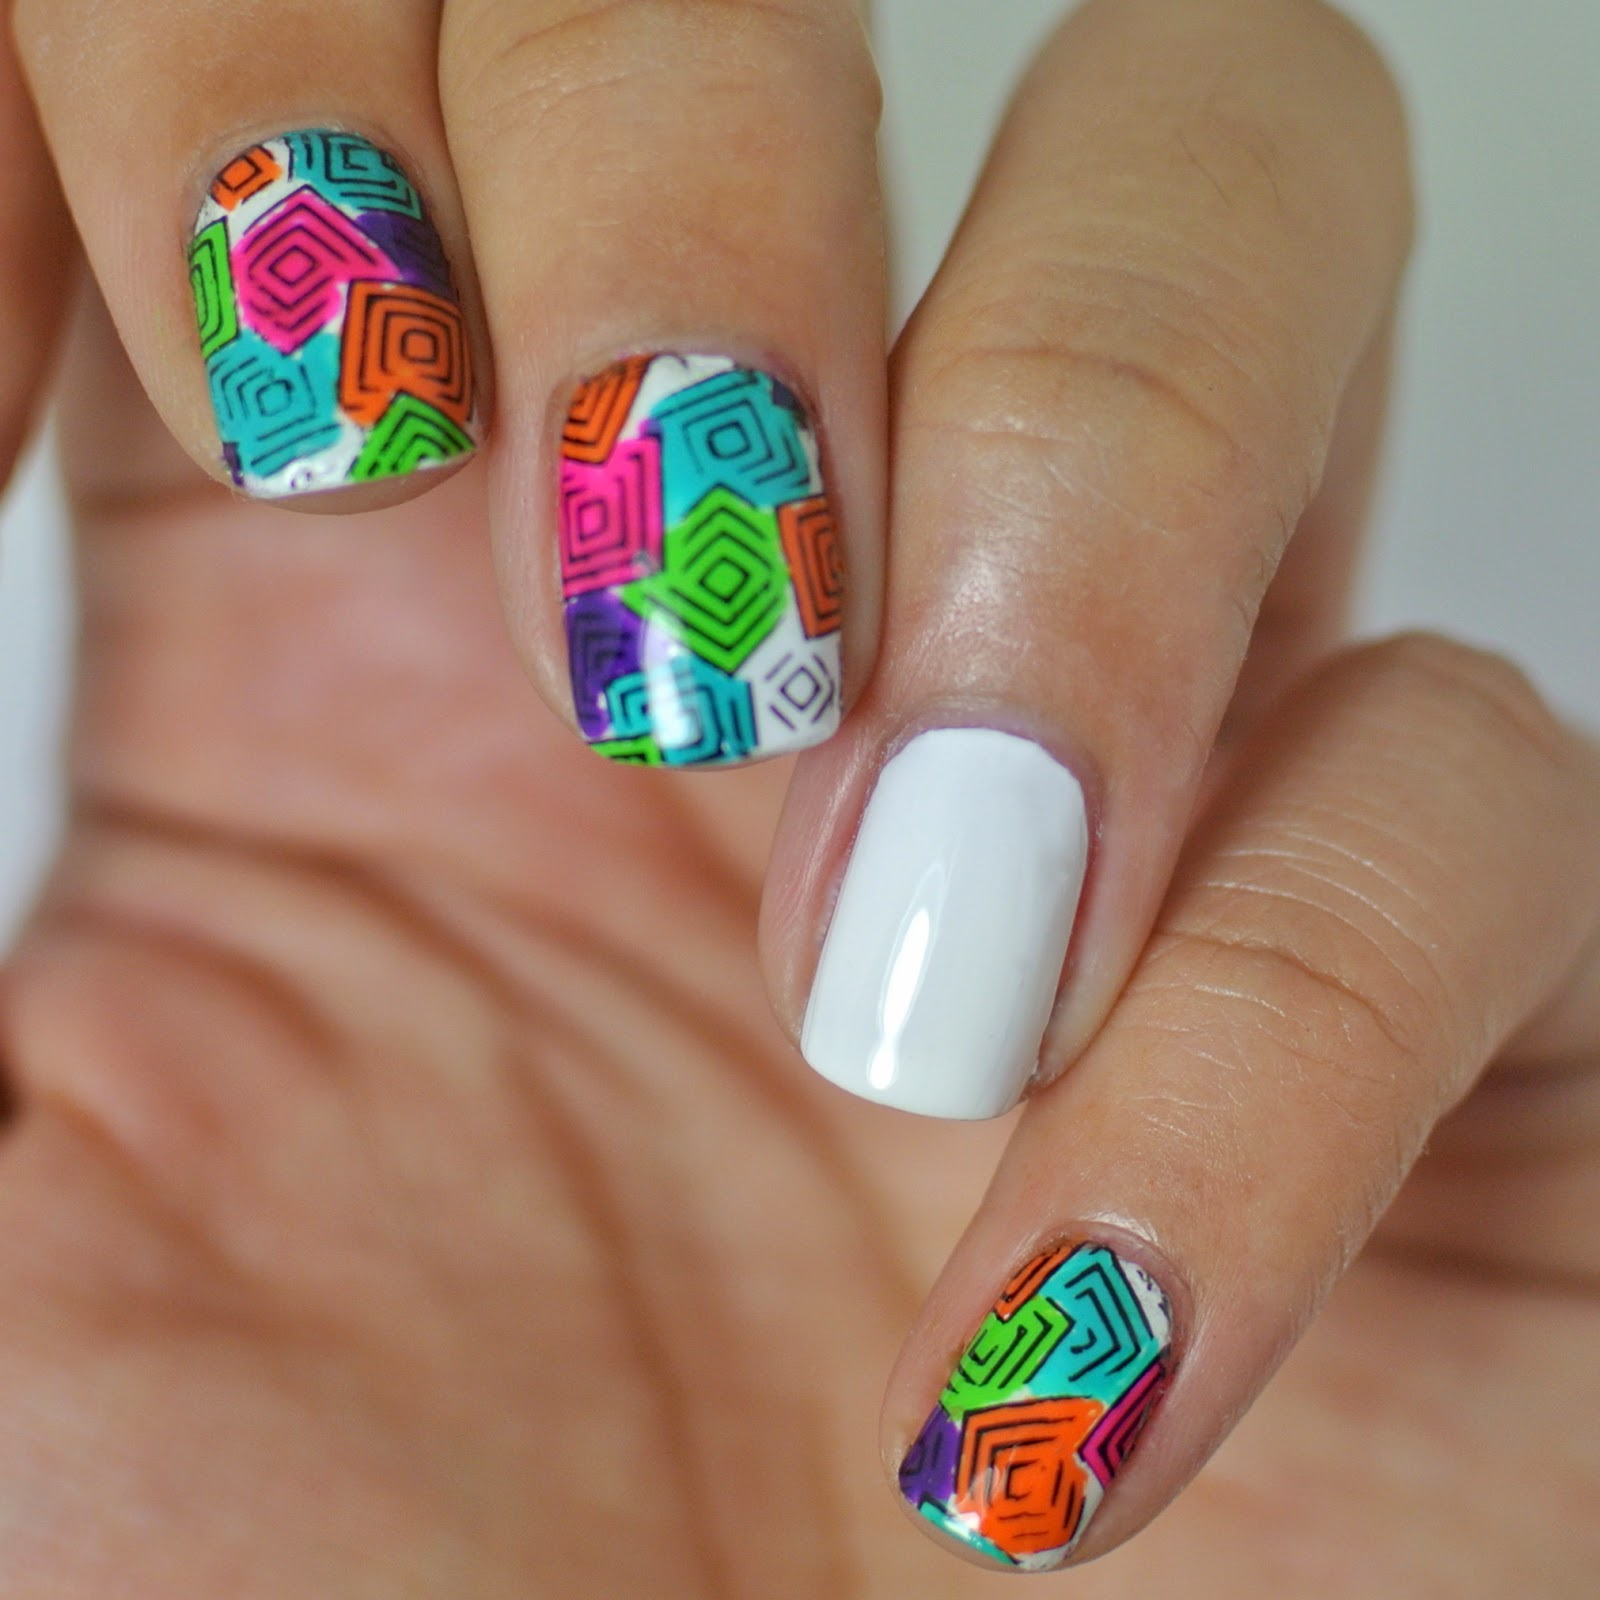 Nails By Gift Moyounails Salon Pro 7 Full Nail Designs Giveaway